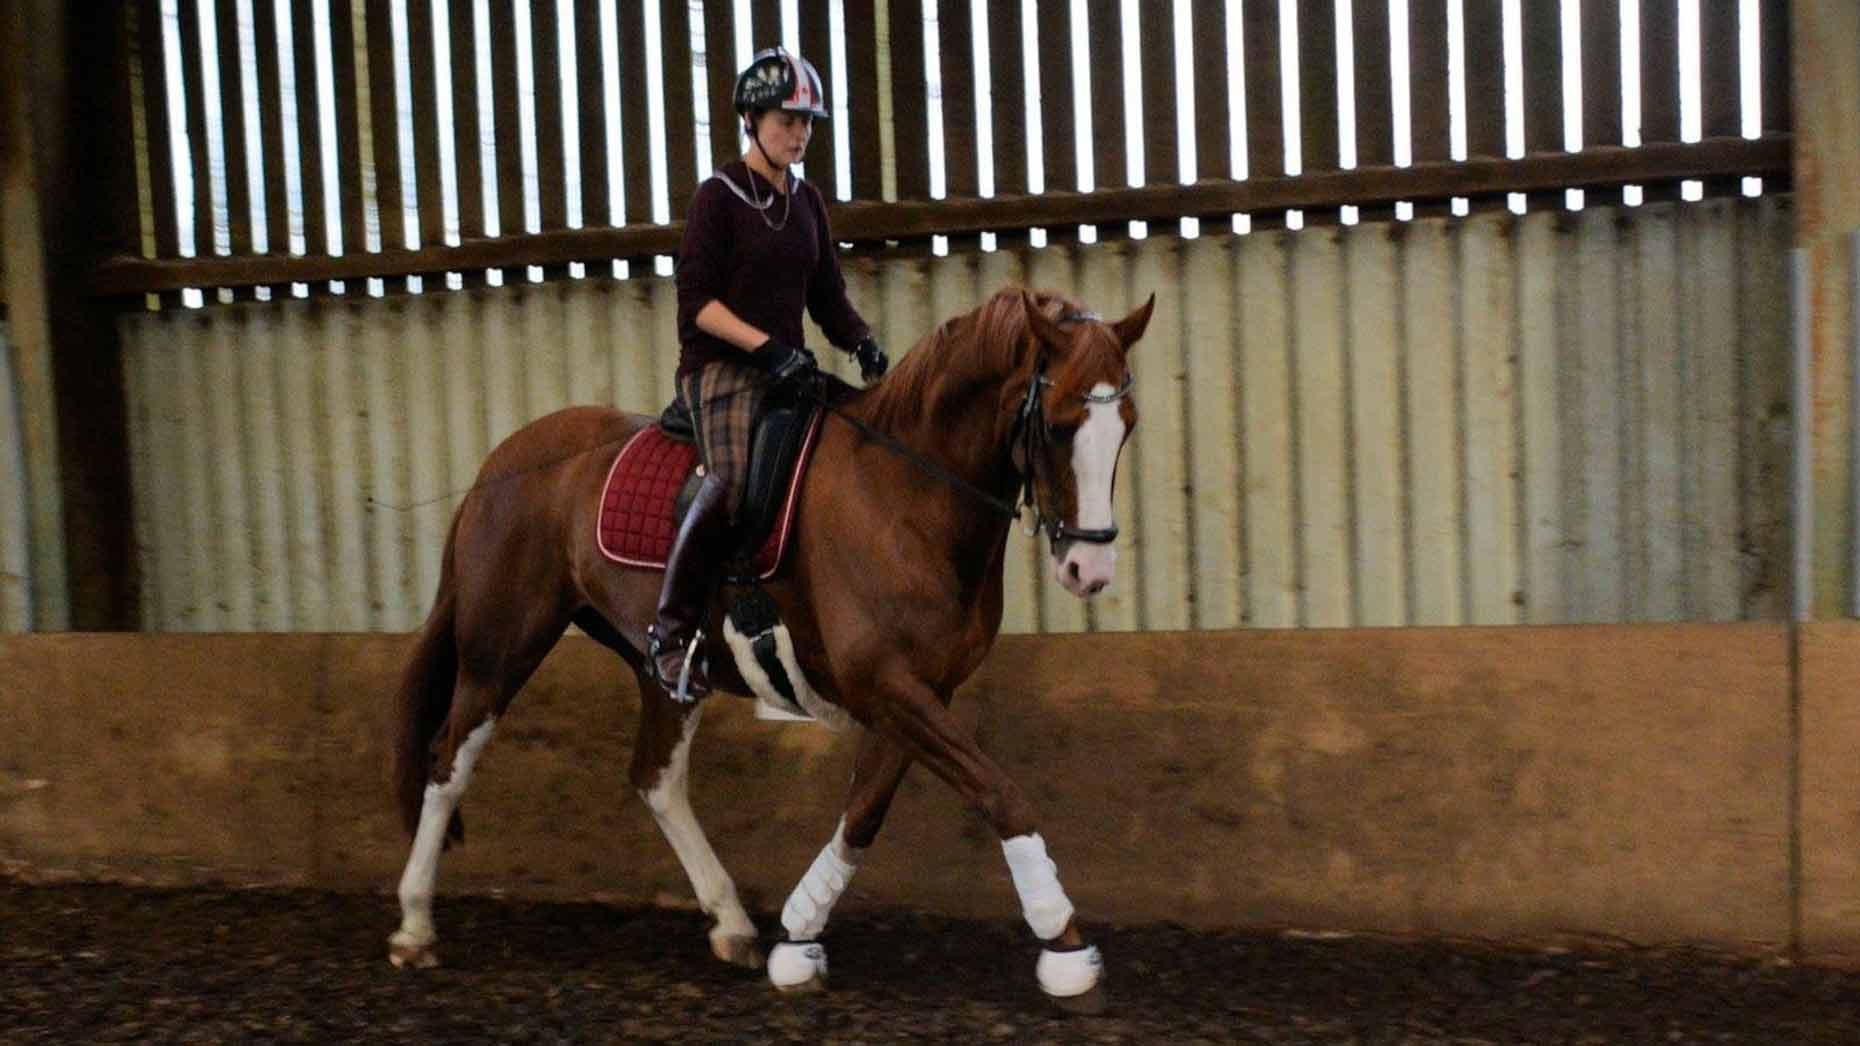 Roberta 'Bert' Sheffield training for the Paralympics 2016. Photo: Bert Sheffield Para Equestrian Rider